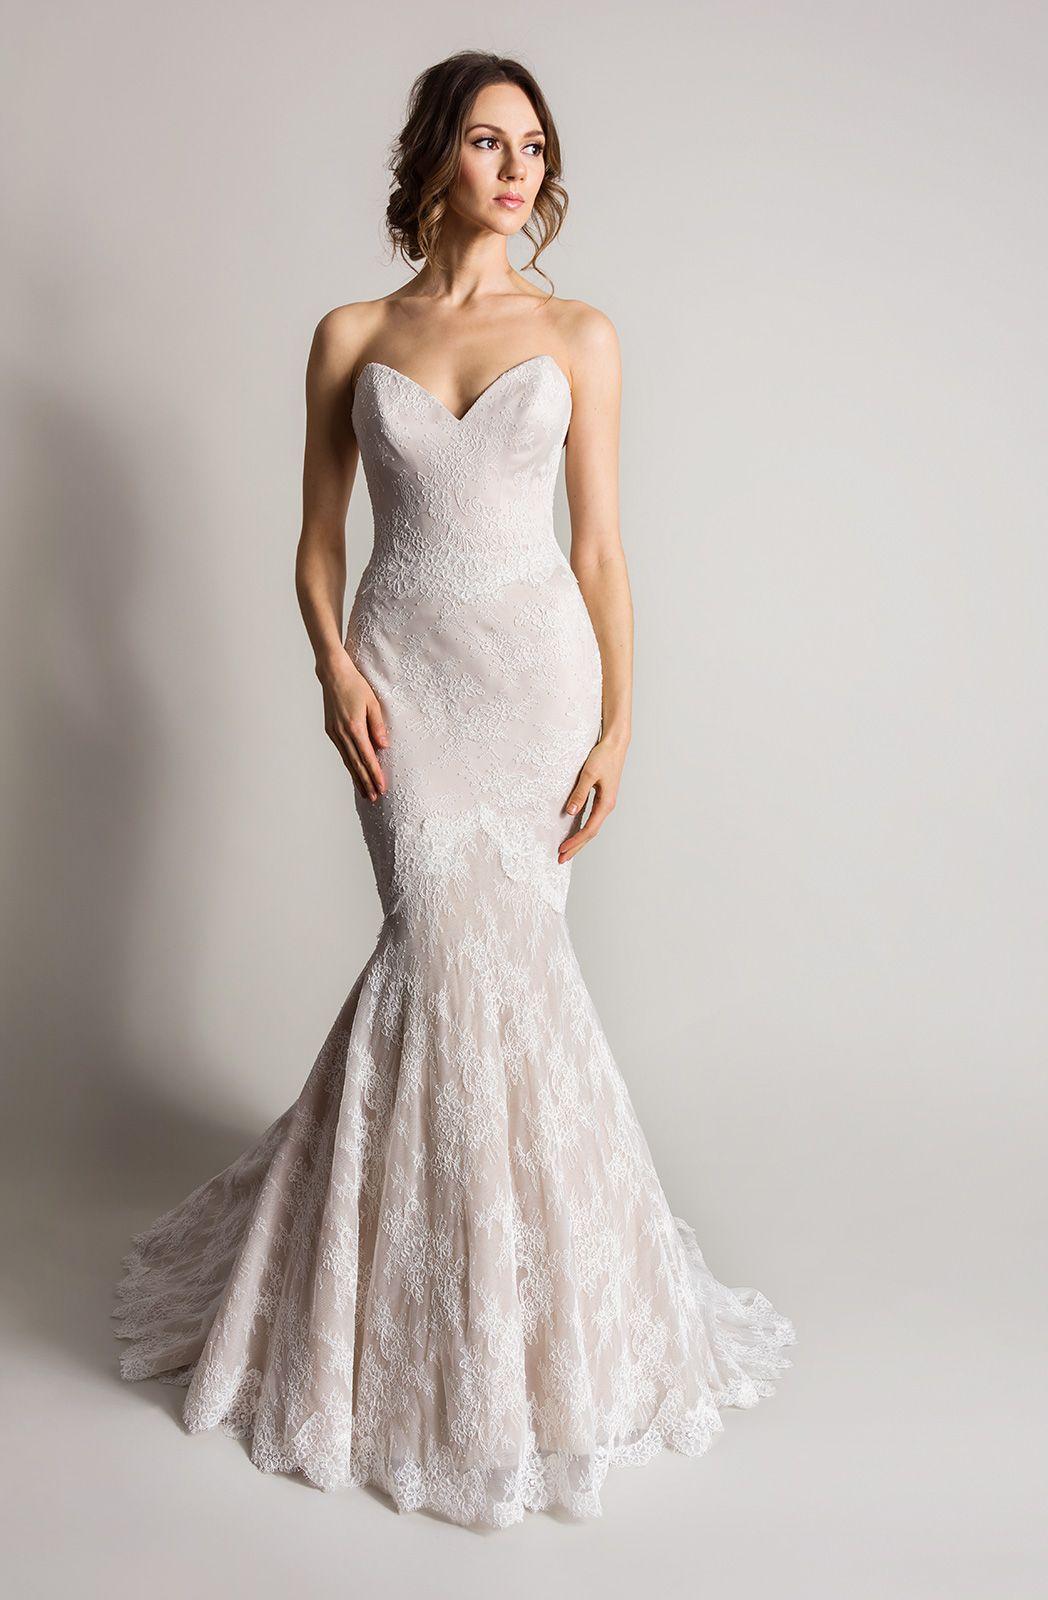 Coloured Wedding Dresses From Top UK Bridal Designers Wedding